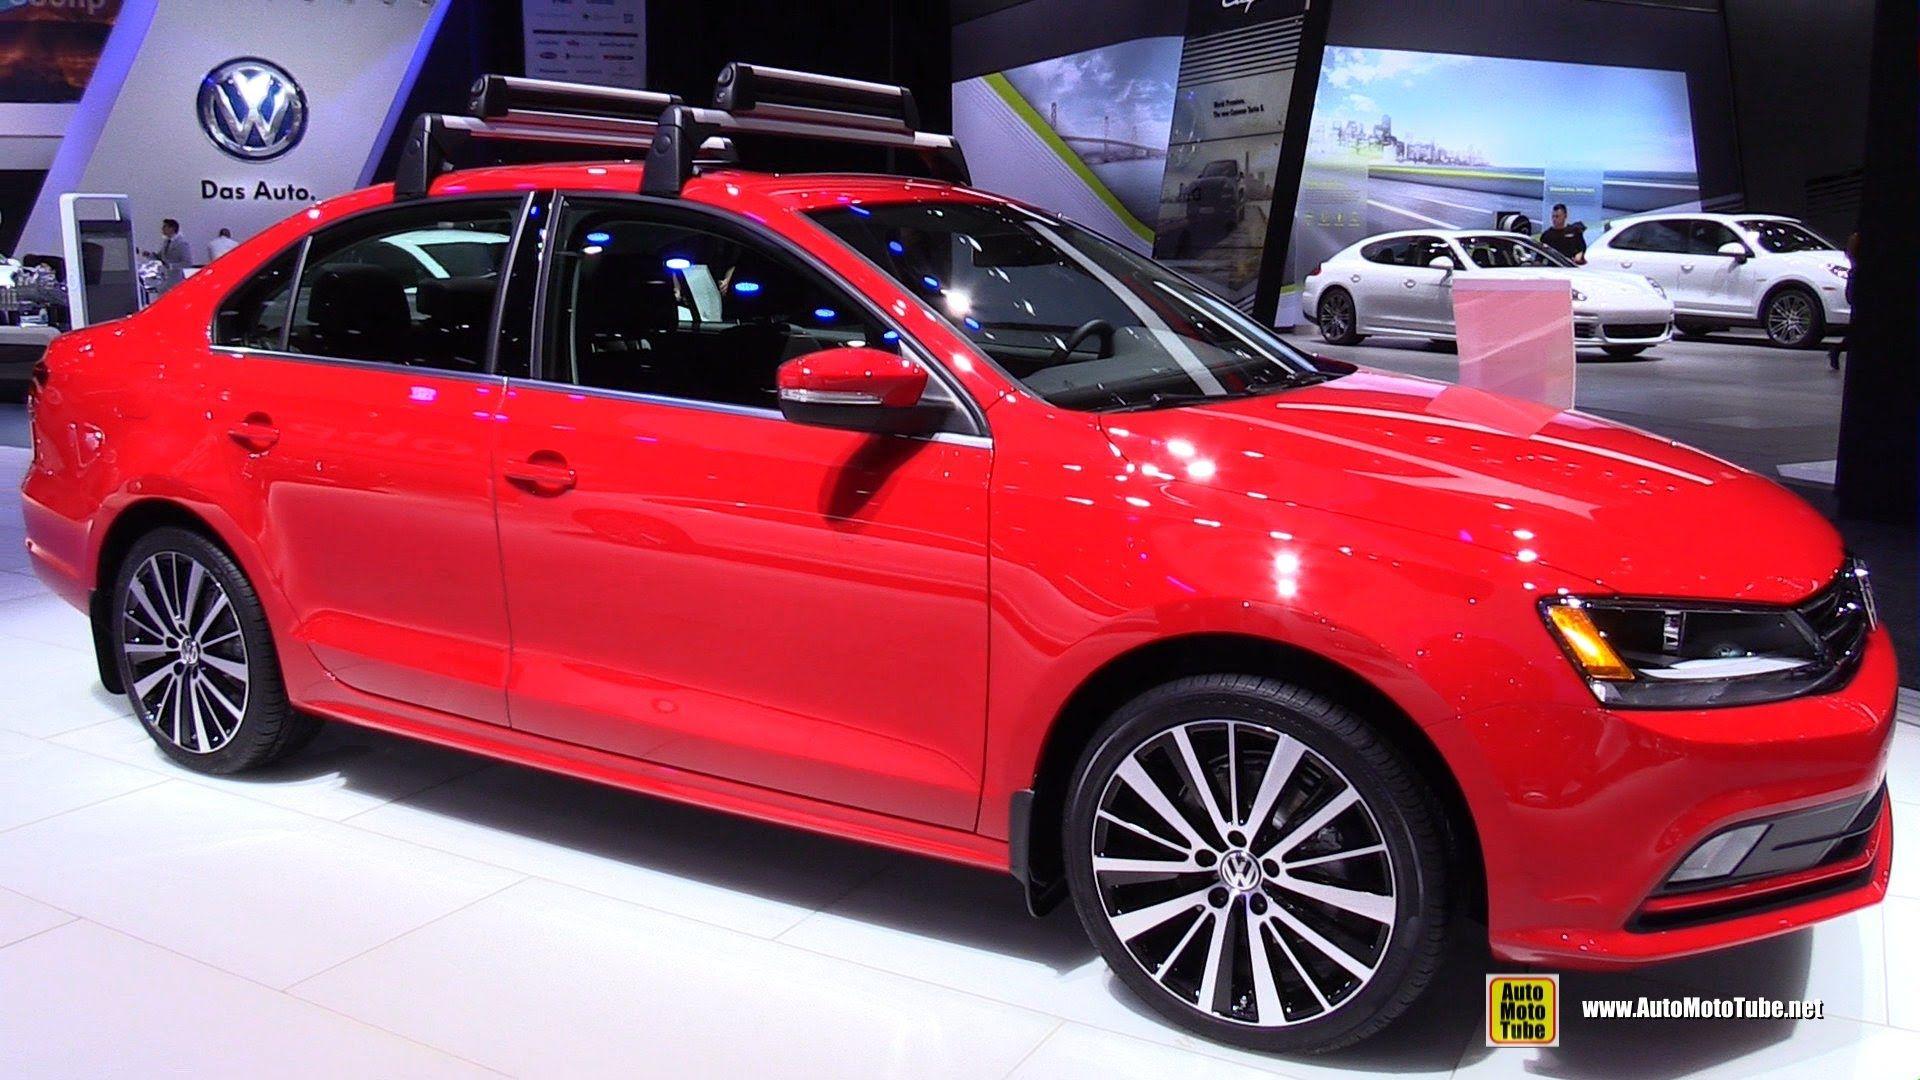 vw new car release2017 VW Jetta GLI and Release  httpfordcarsicom2017vwjetta